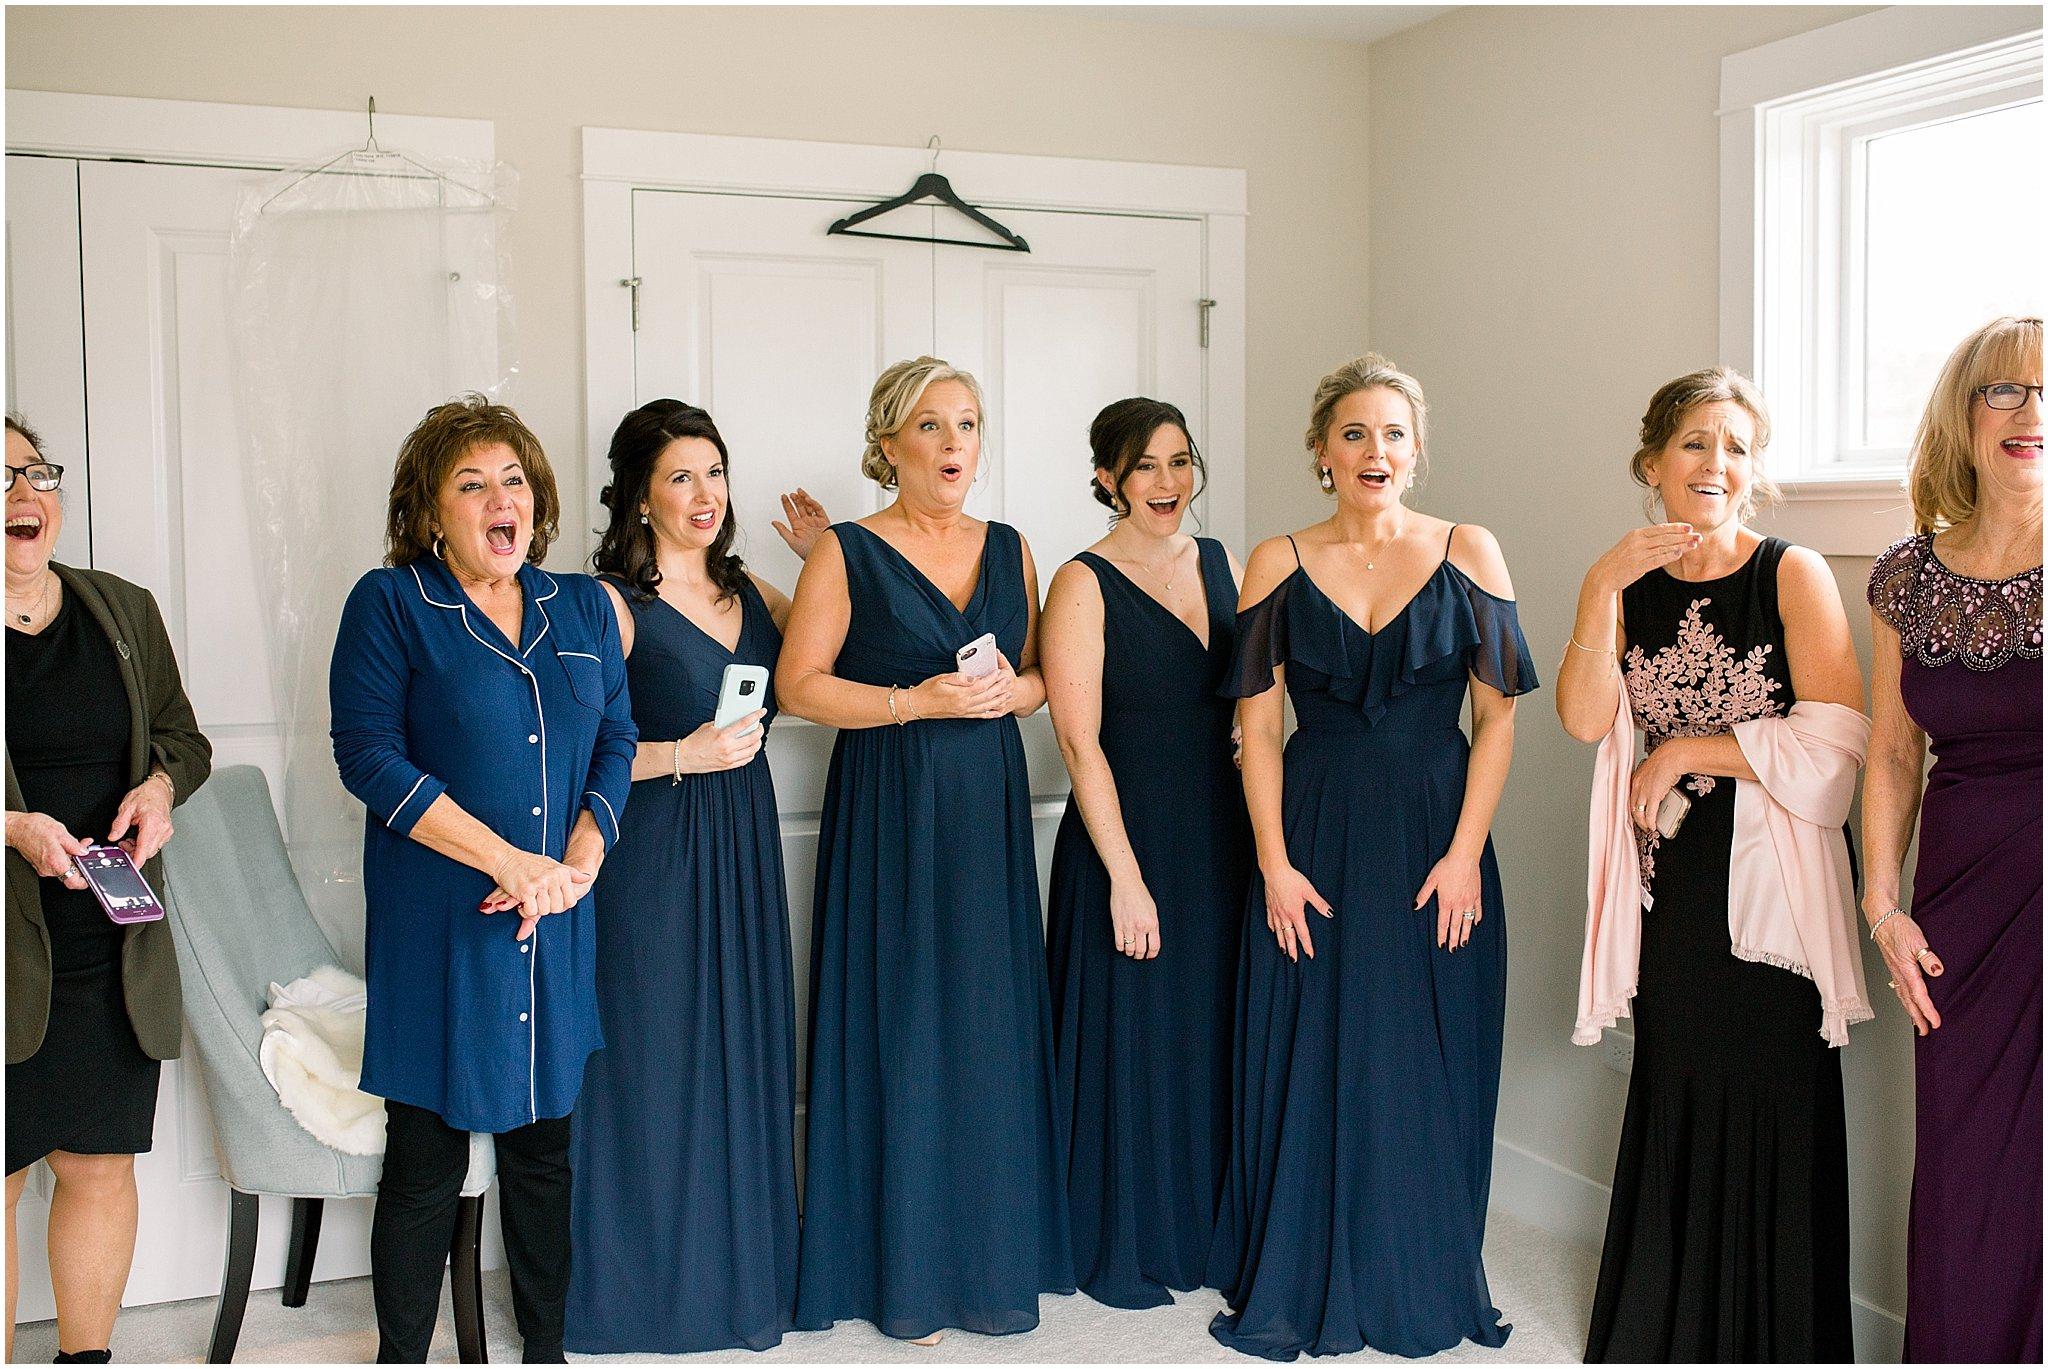 Hyatt-Lodge-Mcdonald-Campus-Wedding_0017.jpg